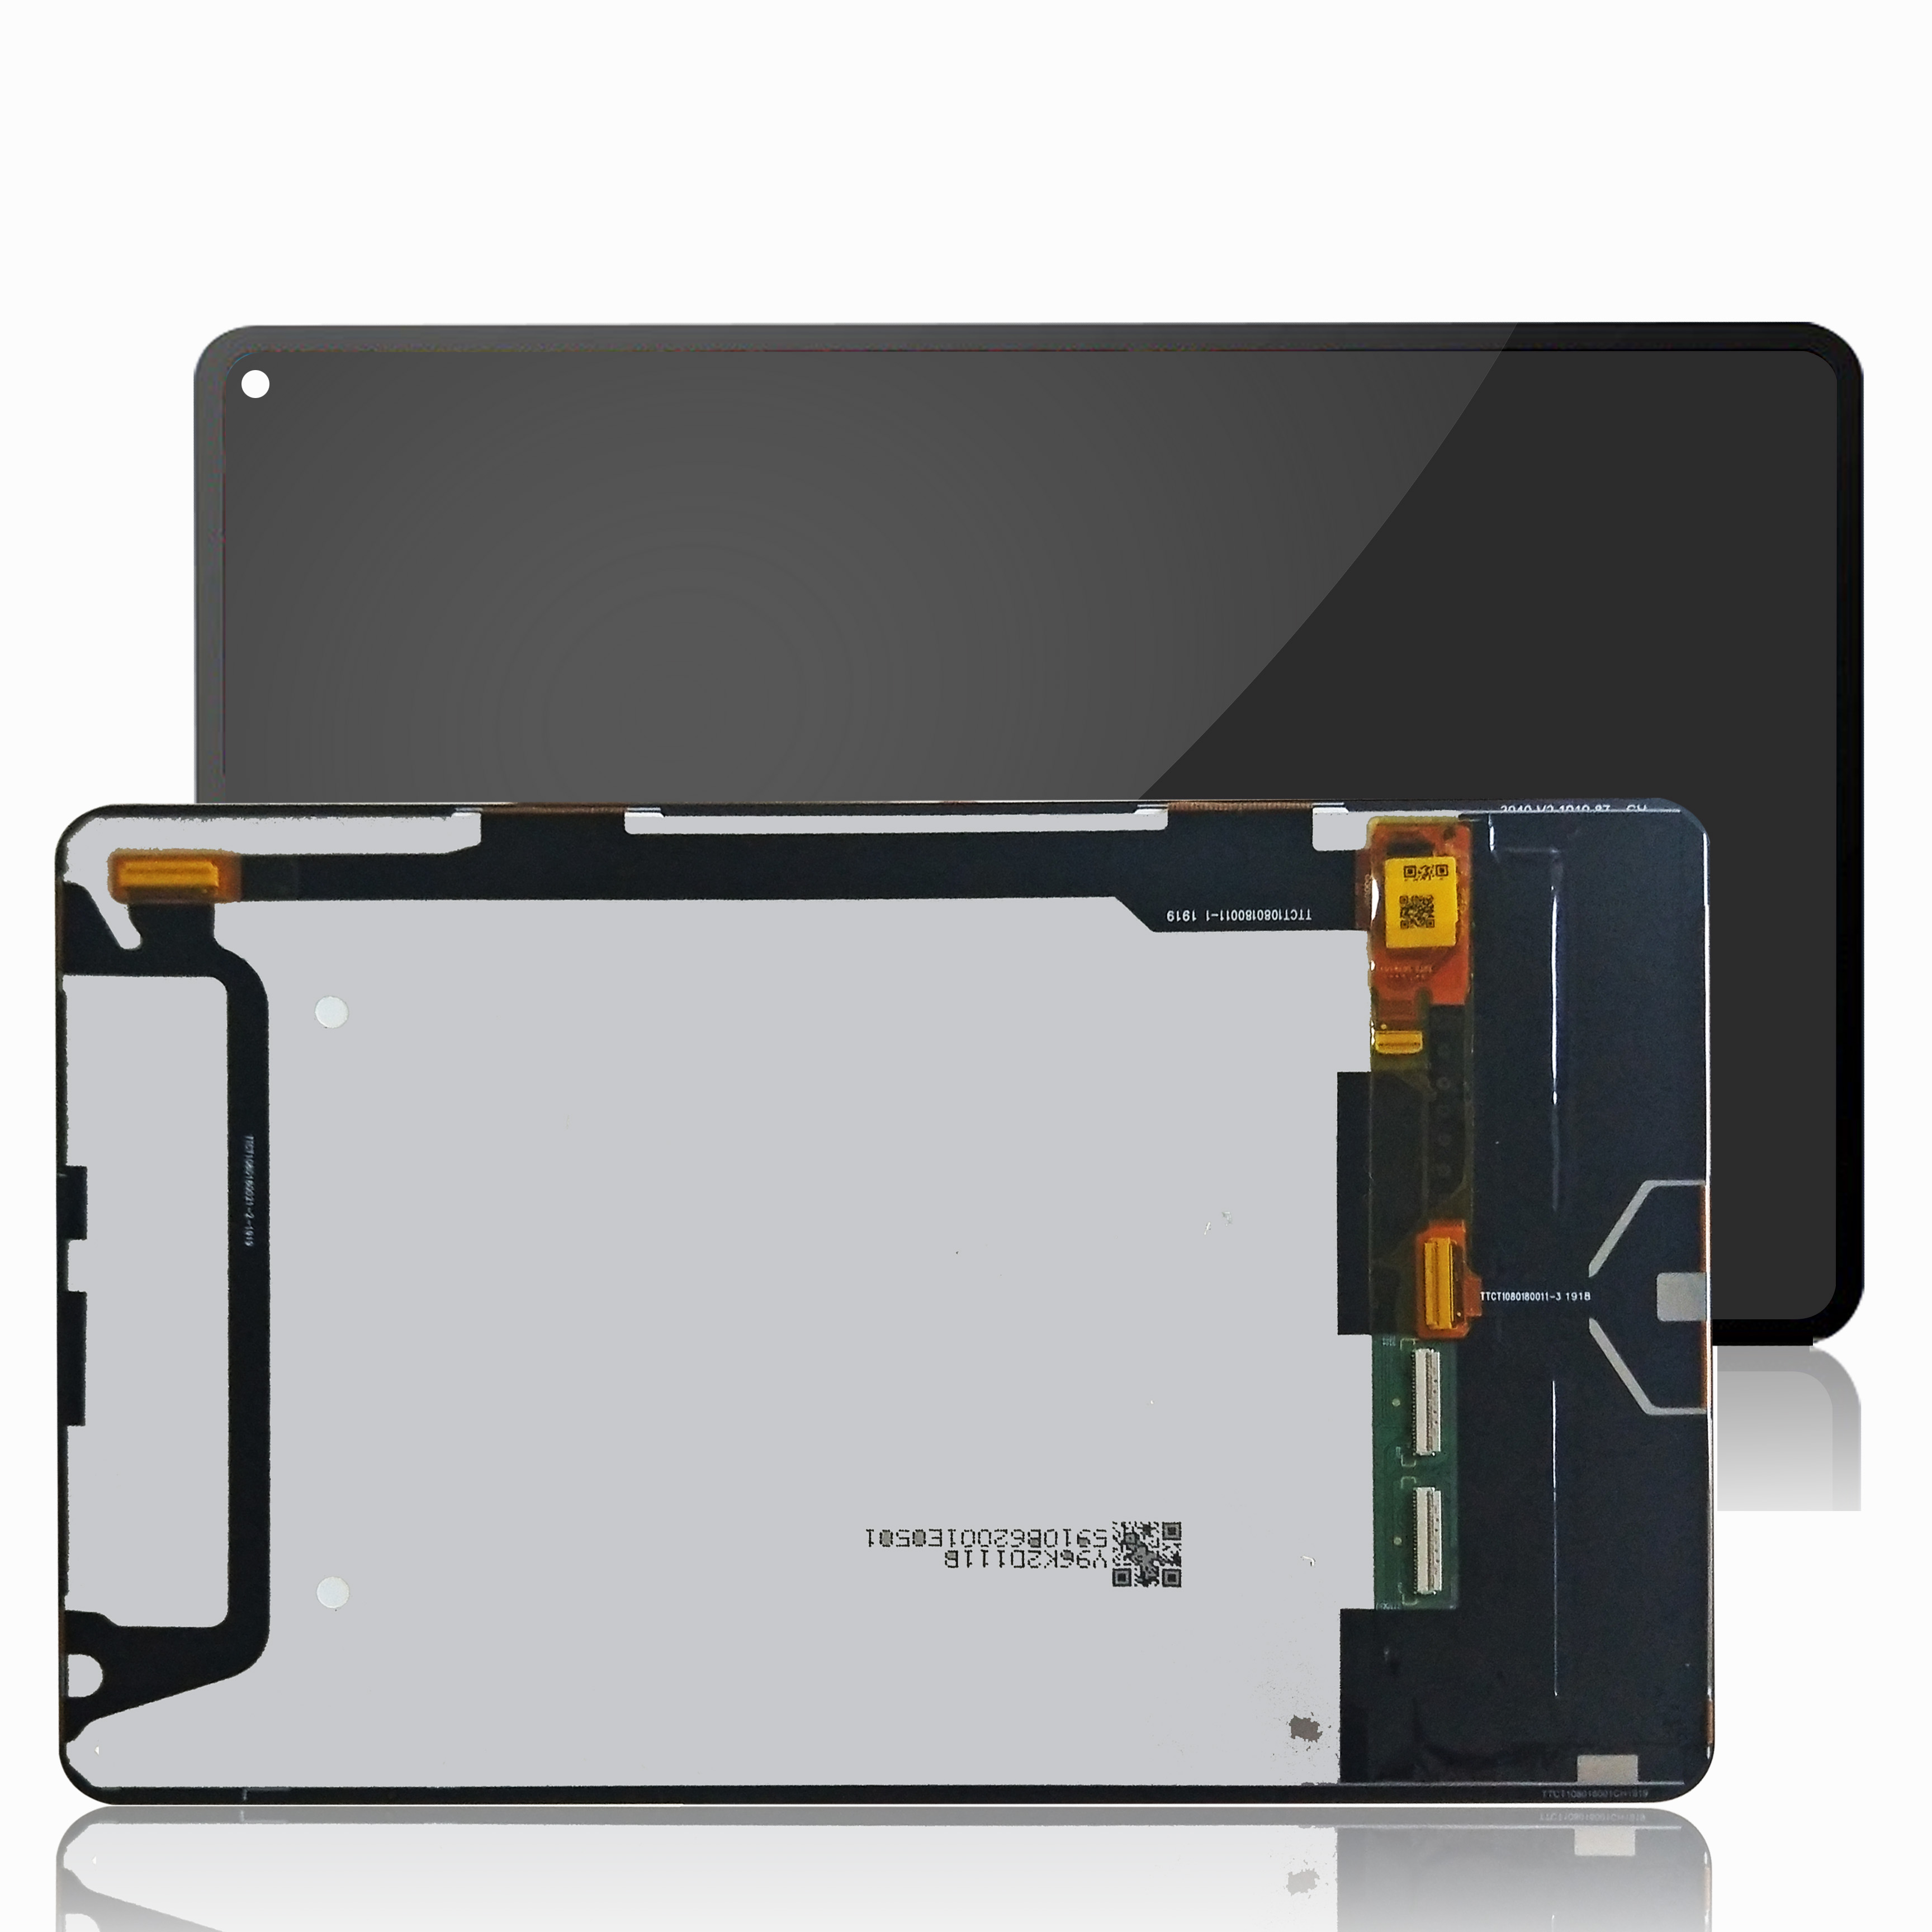 Originale 10.8 per Huawei Matepad Pro MRX W09 MRX W19 MRX AL19 MRX AL09 Display Lcd con Touch Screen Digitizer Assembly - 3